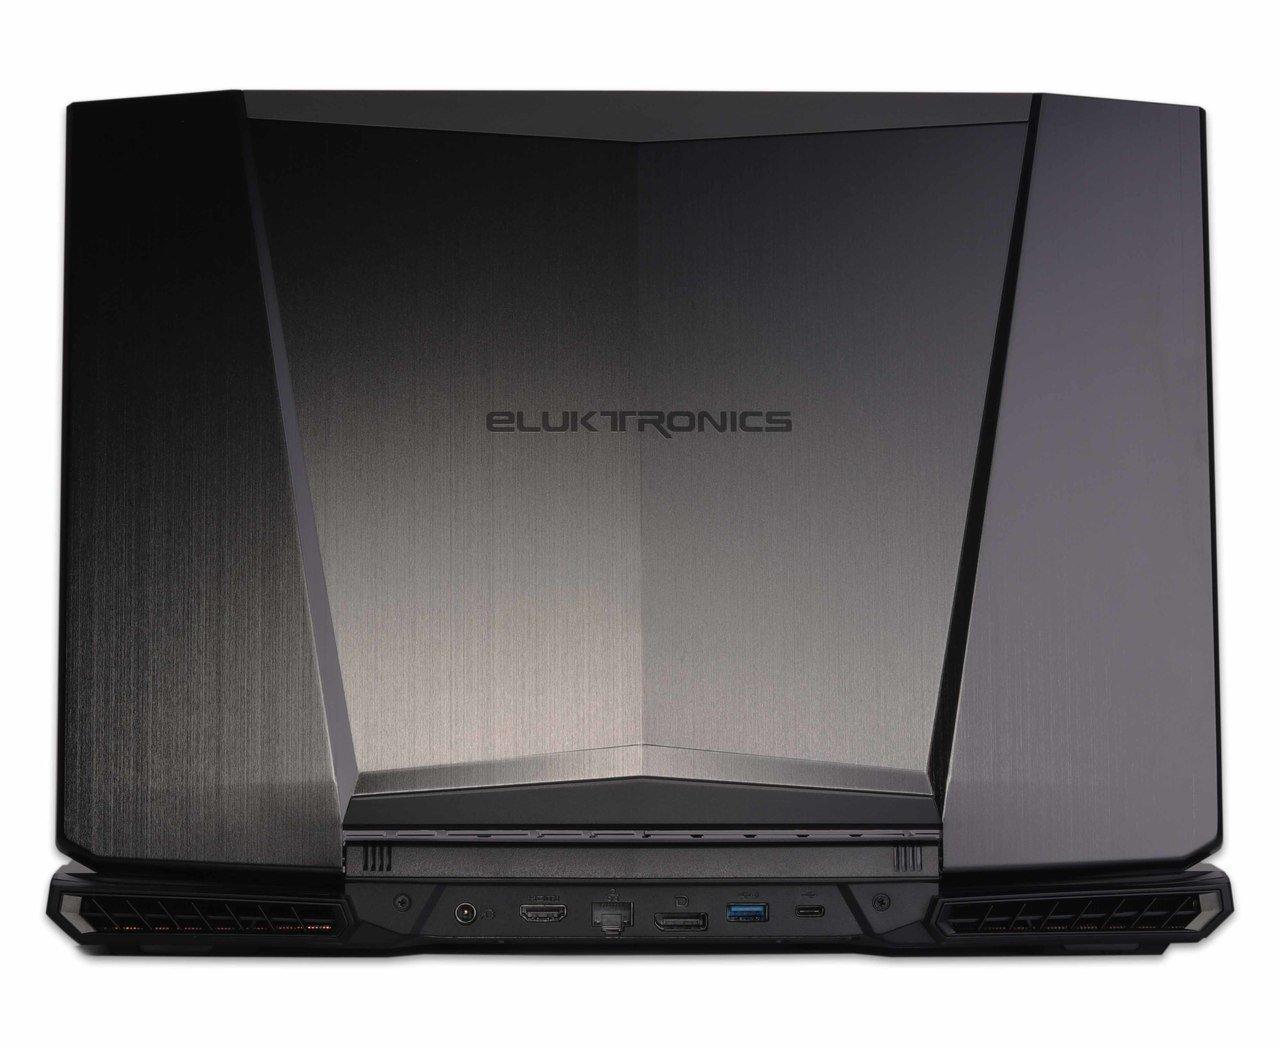 Eluktronics MECH-15HS Premium VR Ready Gaming Laptop with Mechanical Per-Key RGB Backlit Keys – Intel i7-7700HQ CPU 8GB…